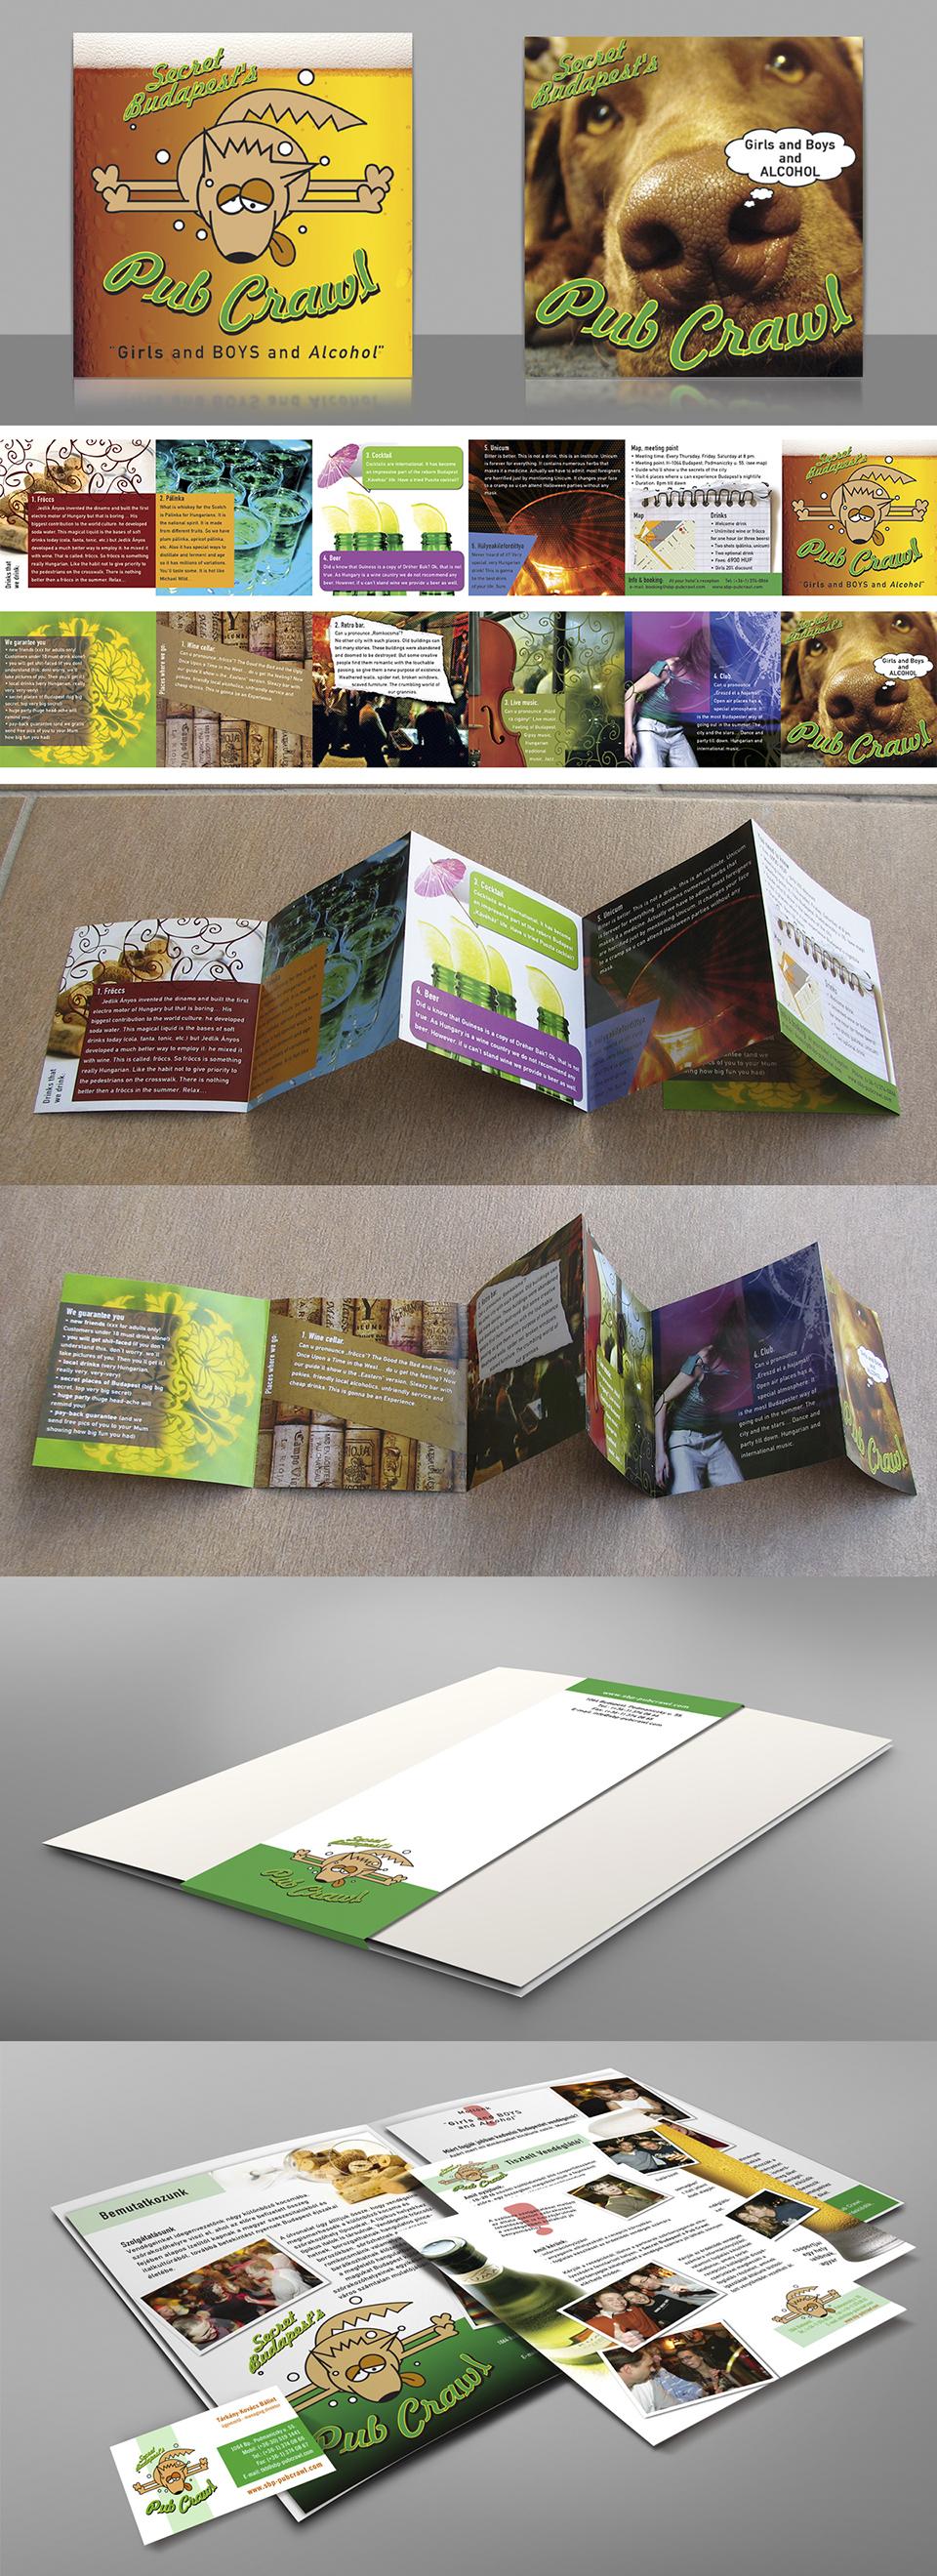 PubCrawl arculat és print anyagok